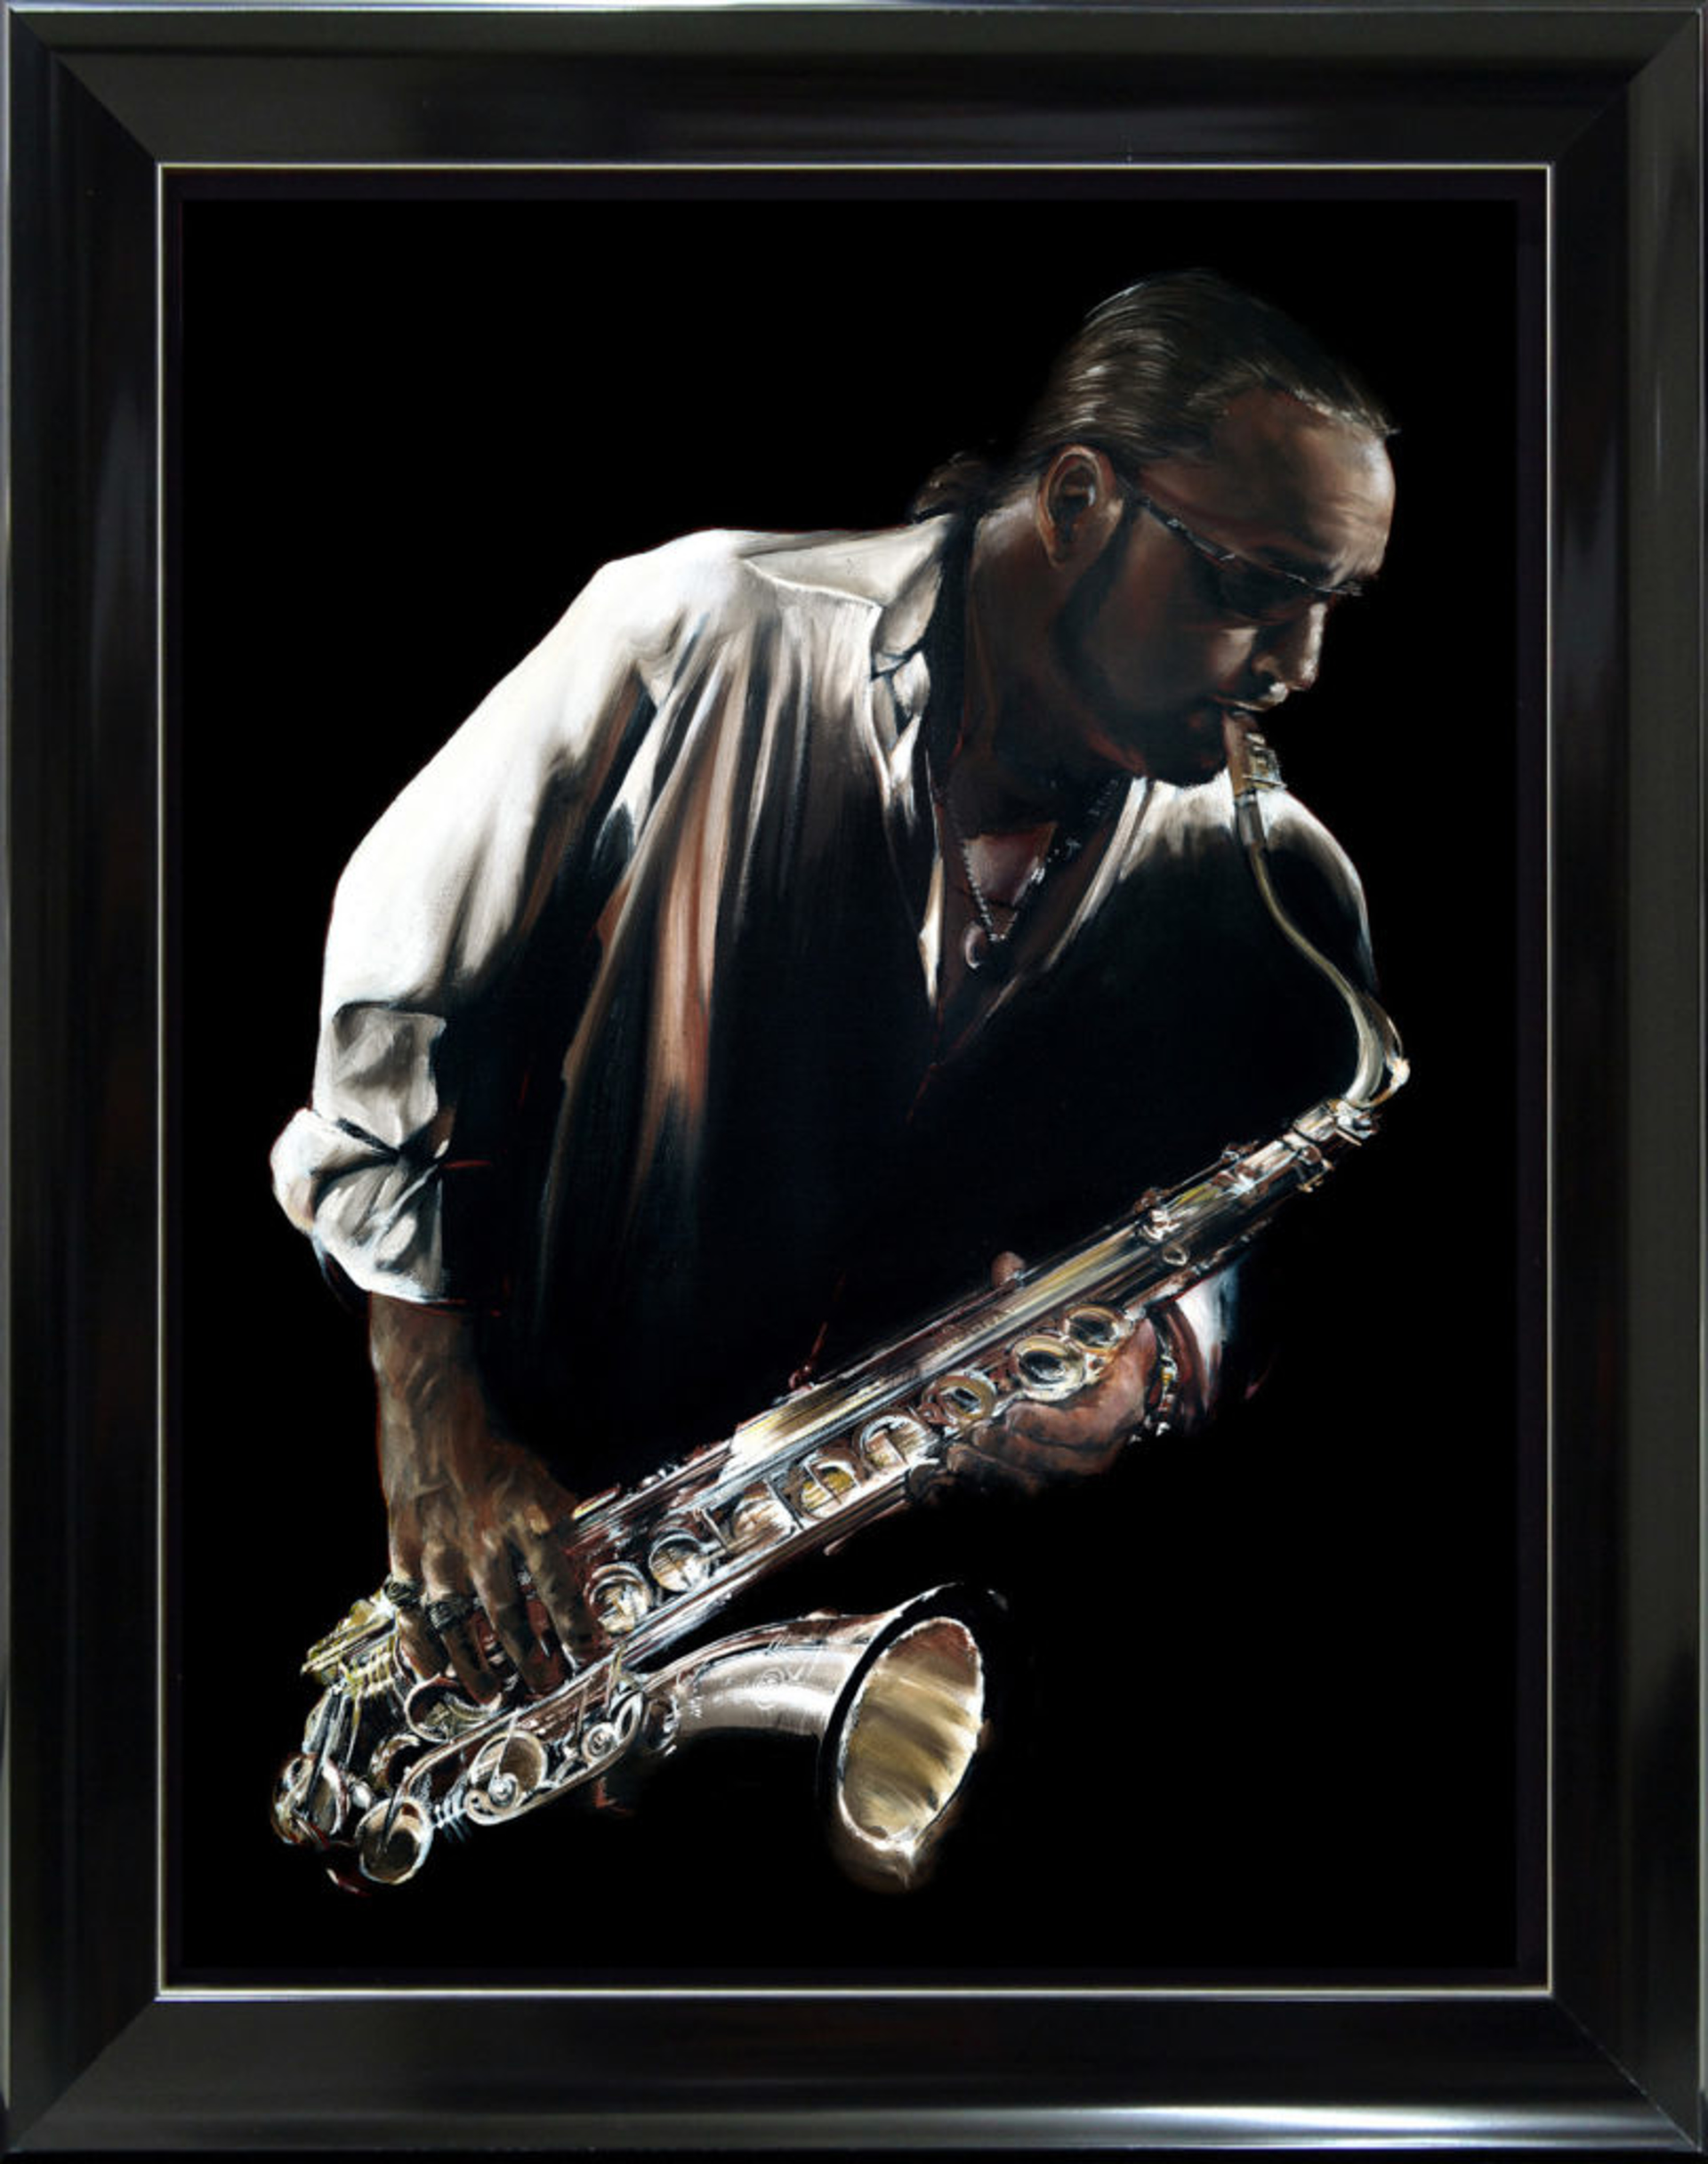 Jazzman on Metal by Bill Mack